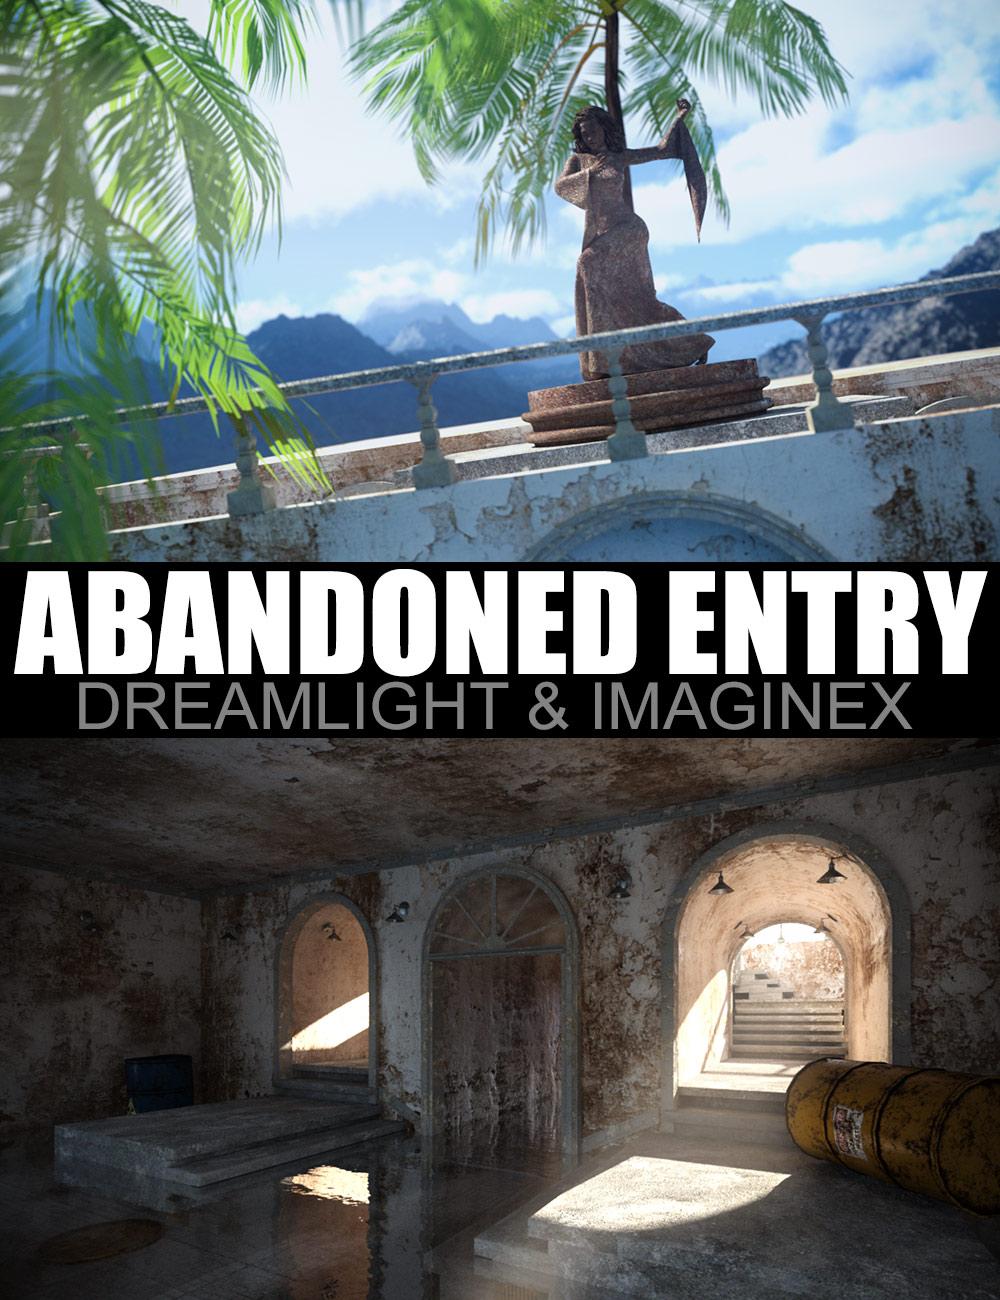 Abandoned Entry by: DreamlightImagineX, 3D Models by Daz 3D